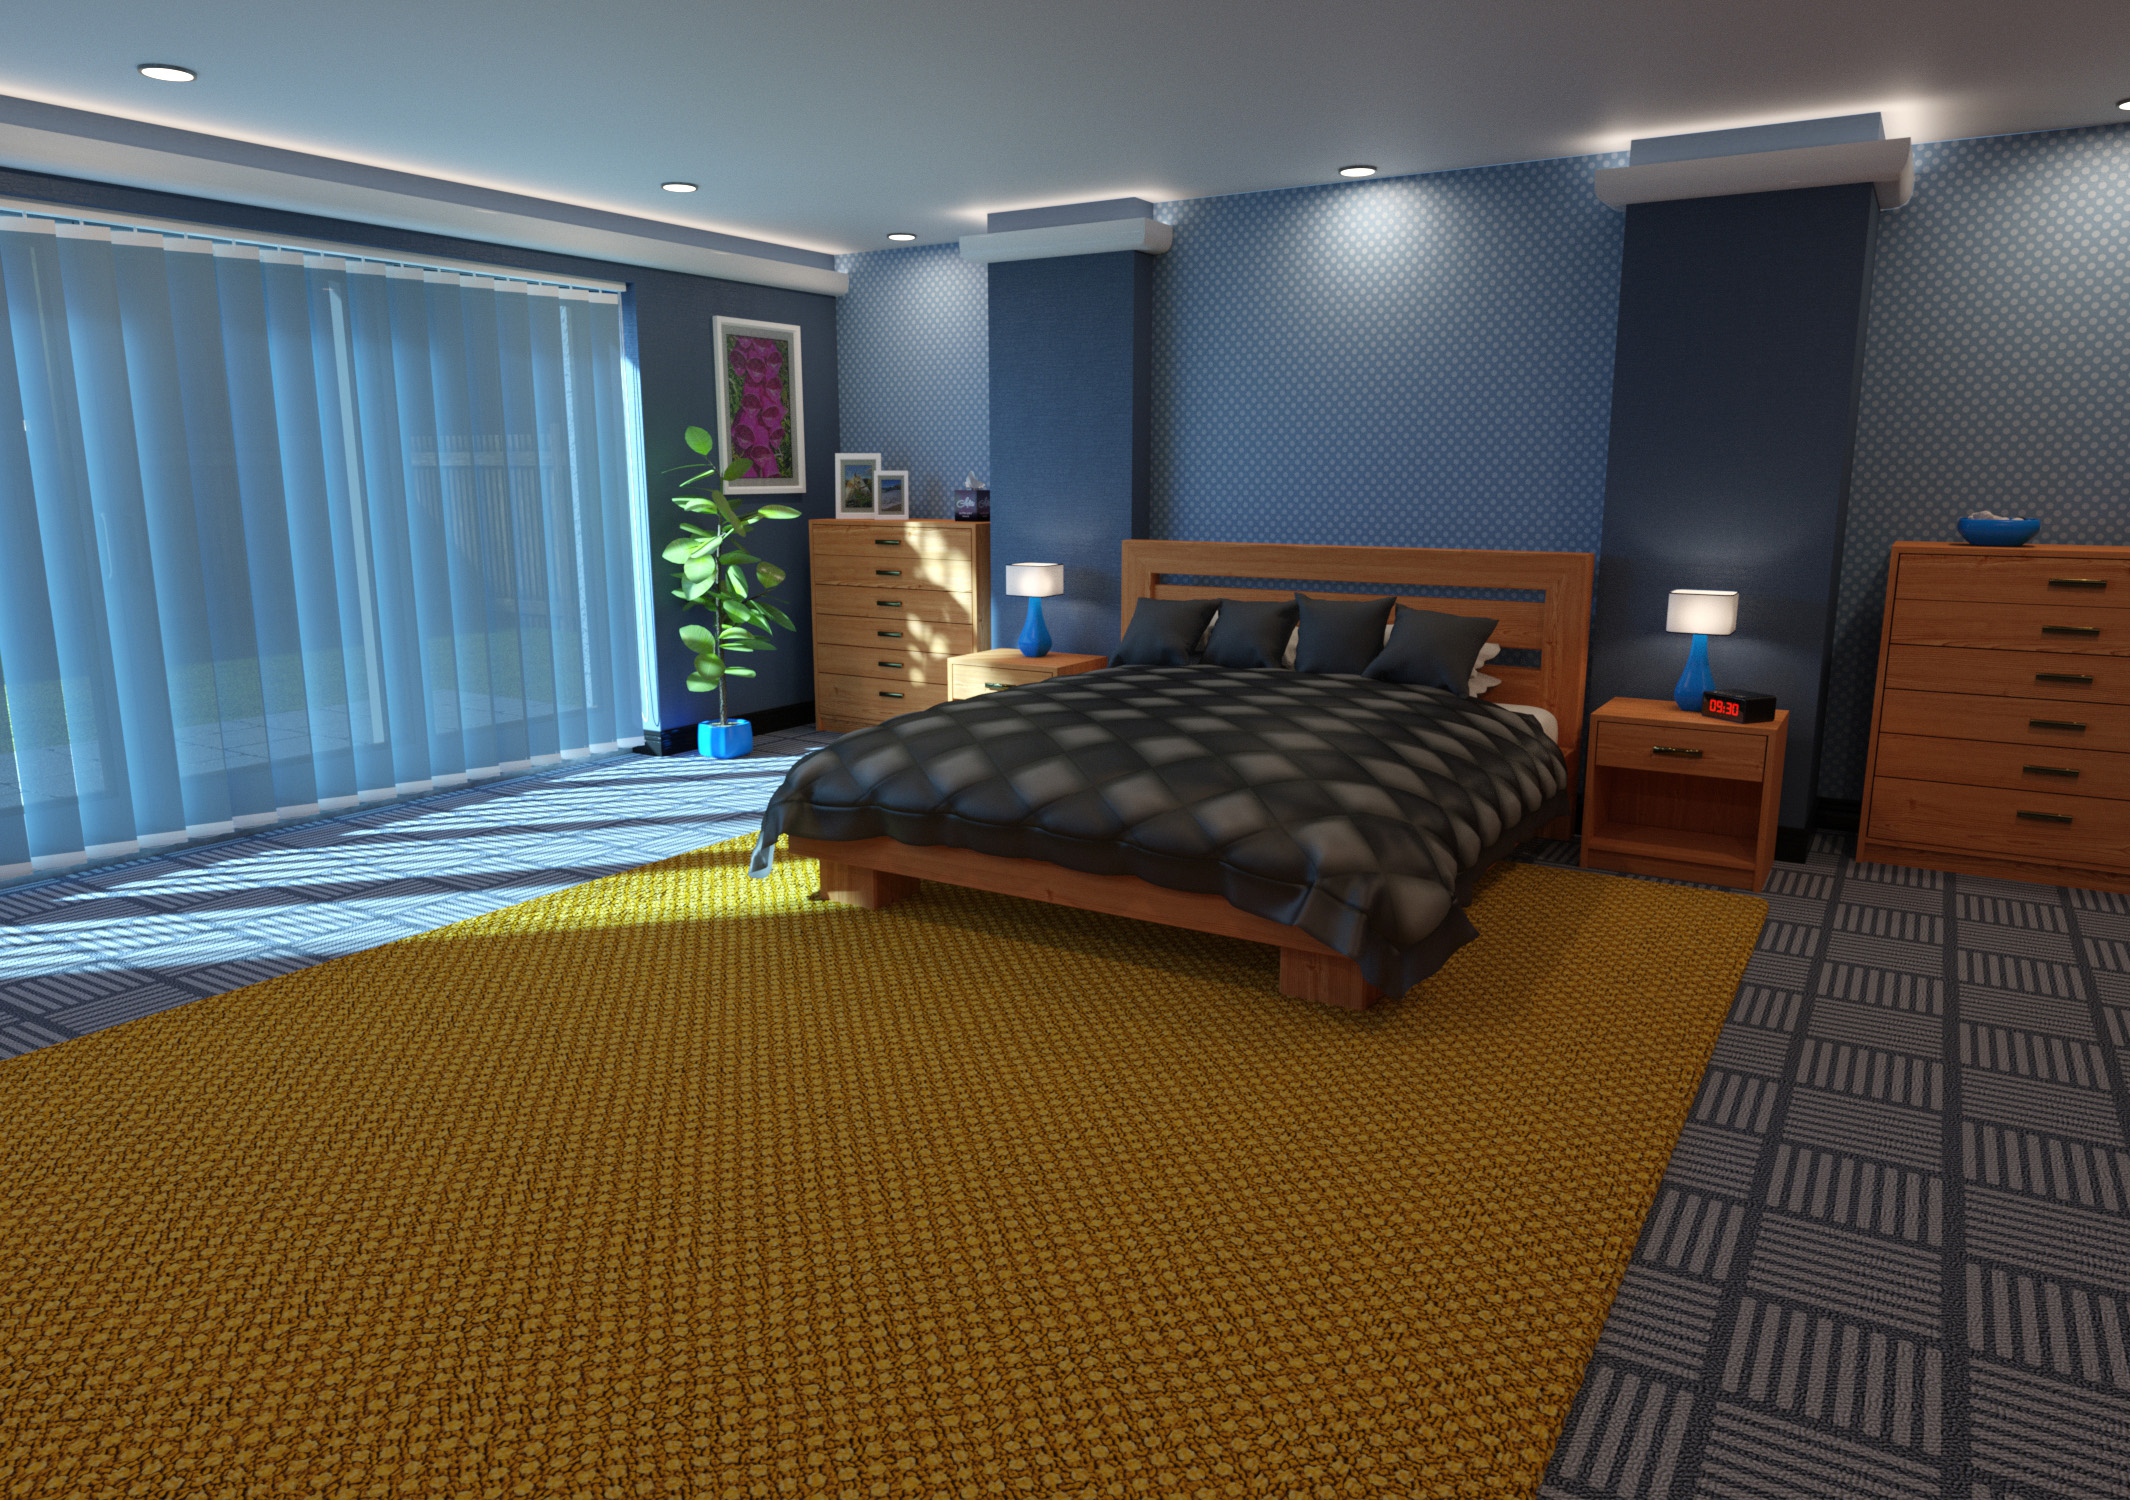 Granite Bedroom - Predatron 3D Models